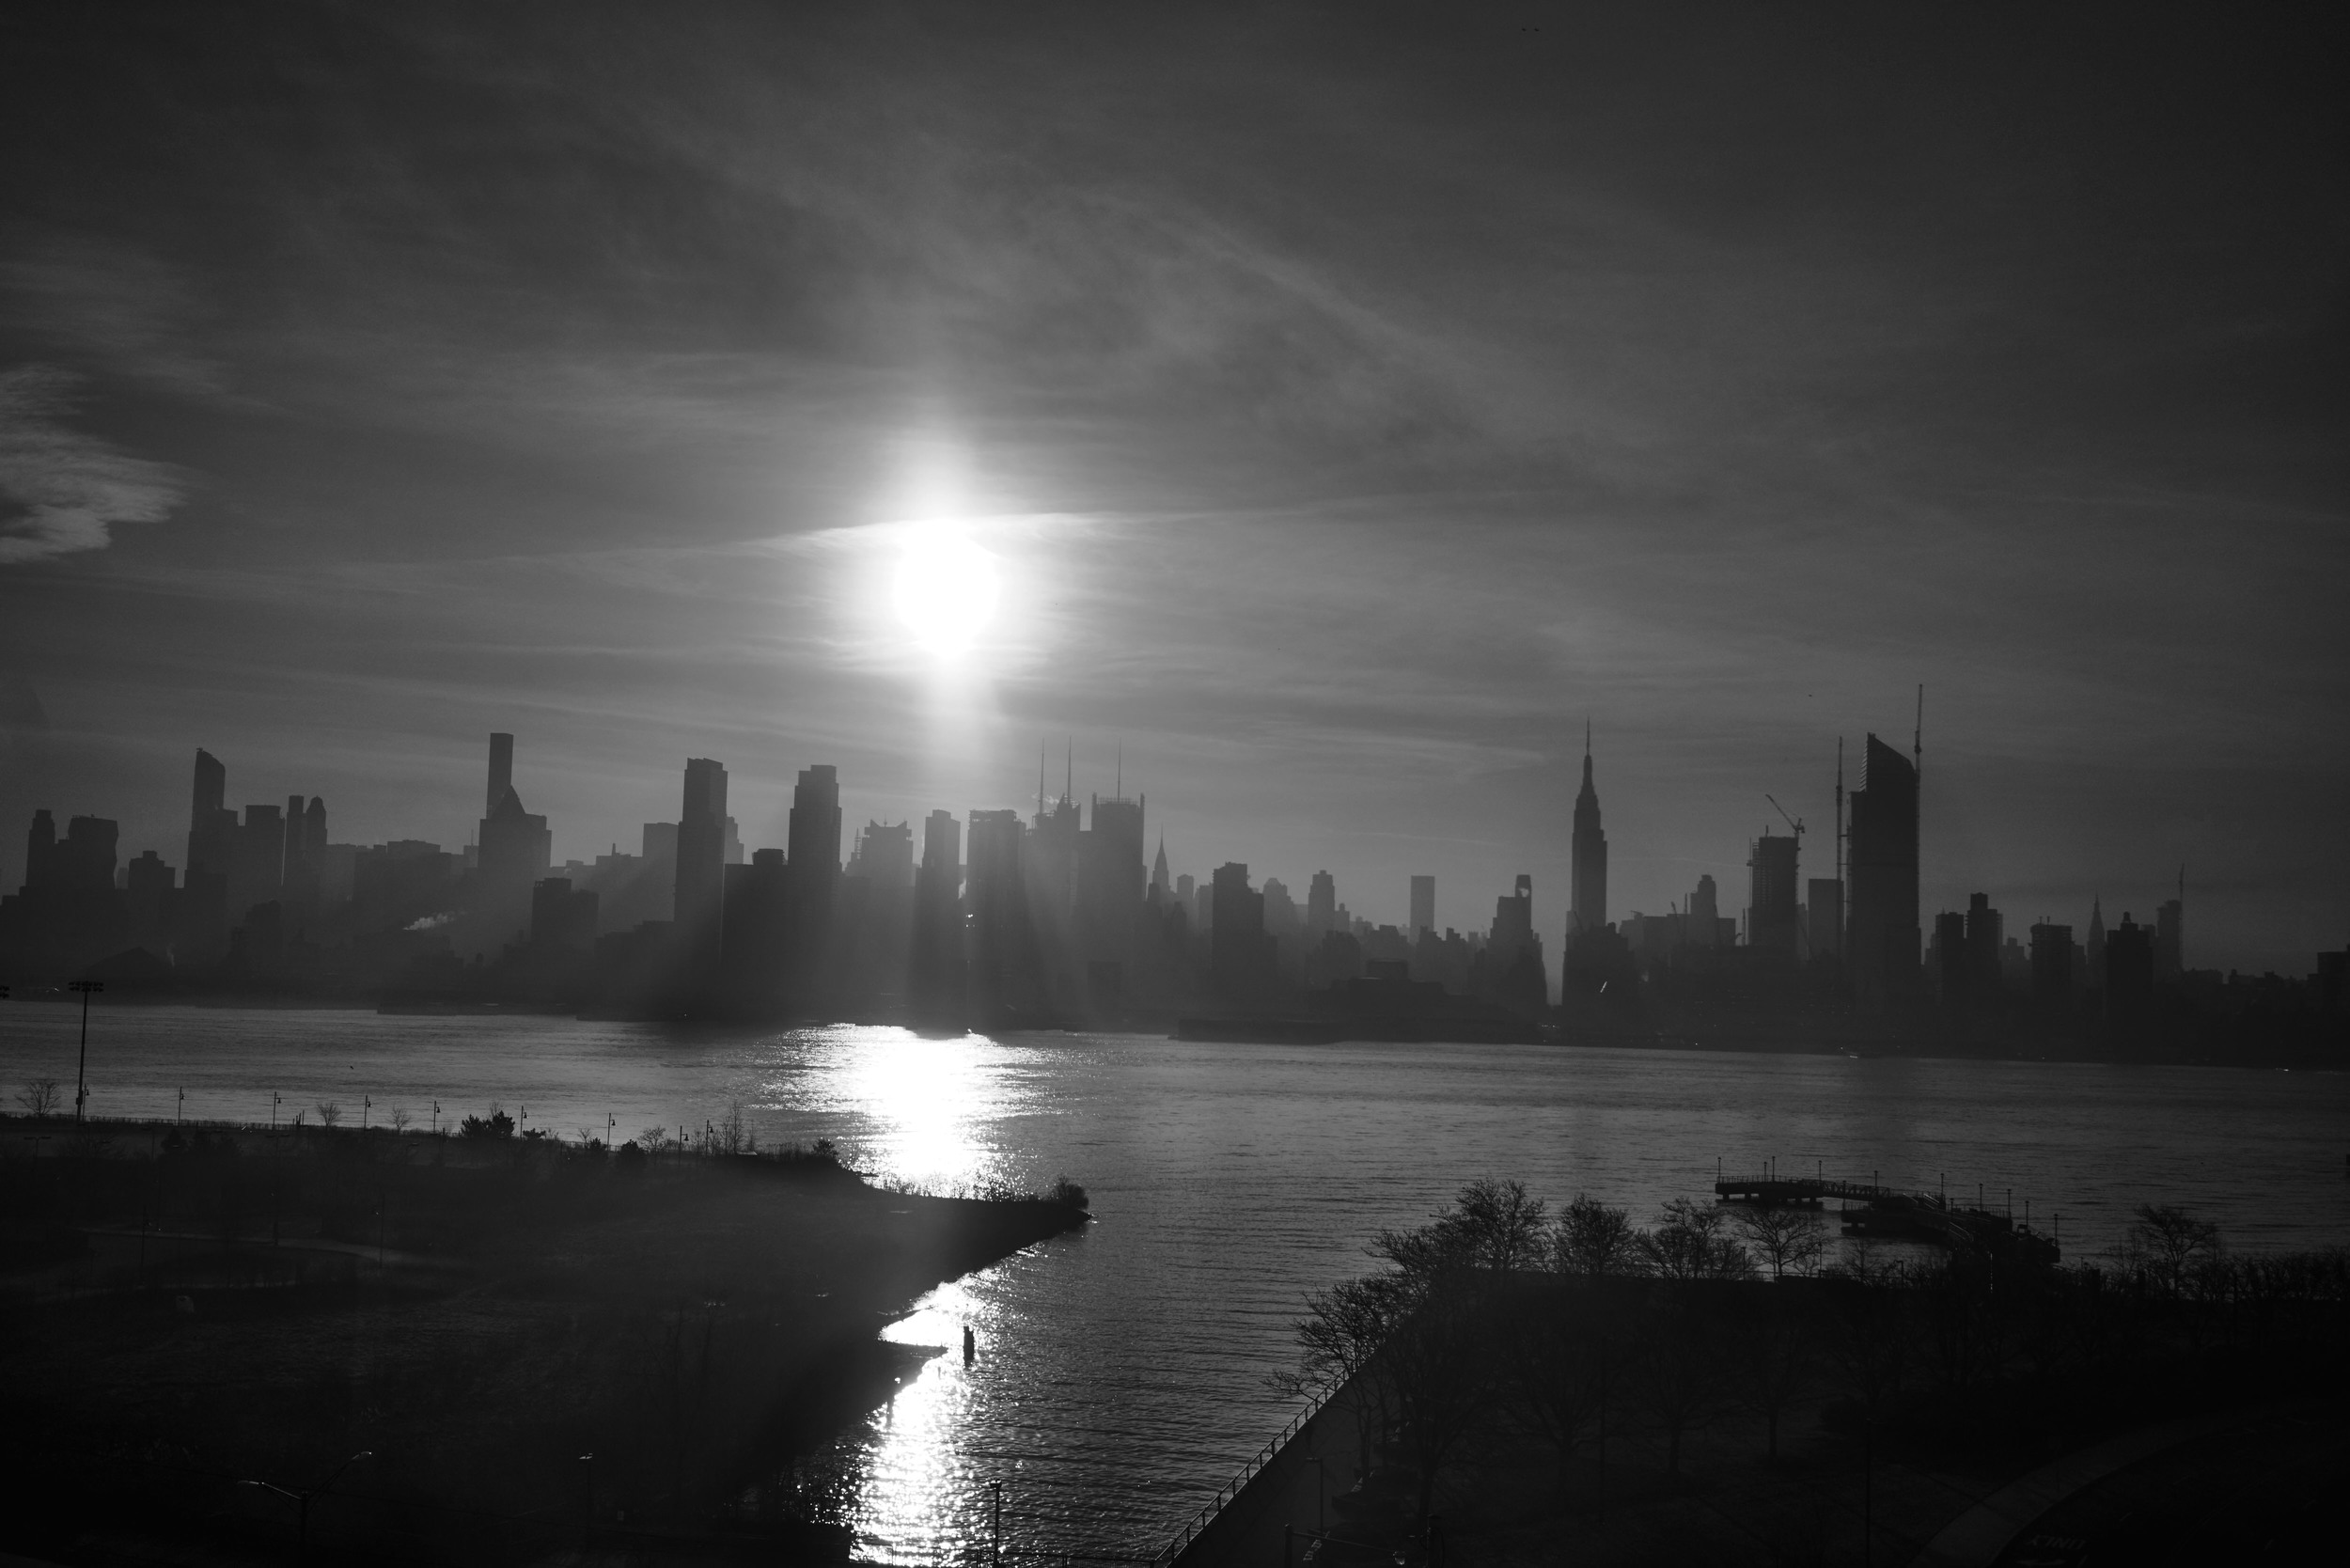 NYC_Skyline_ViewfromLincolnTunnel-001.jpg